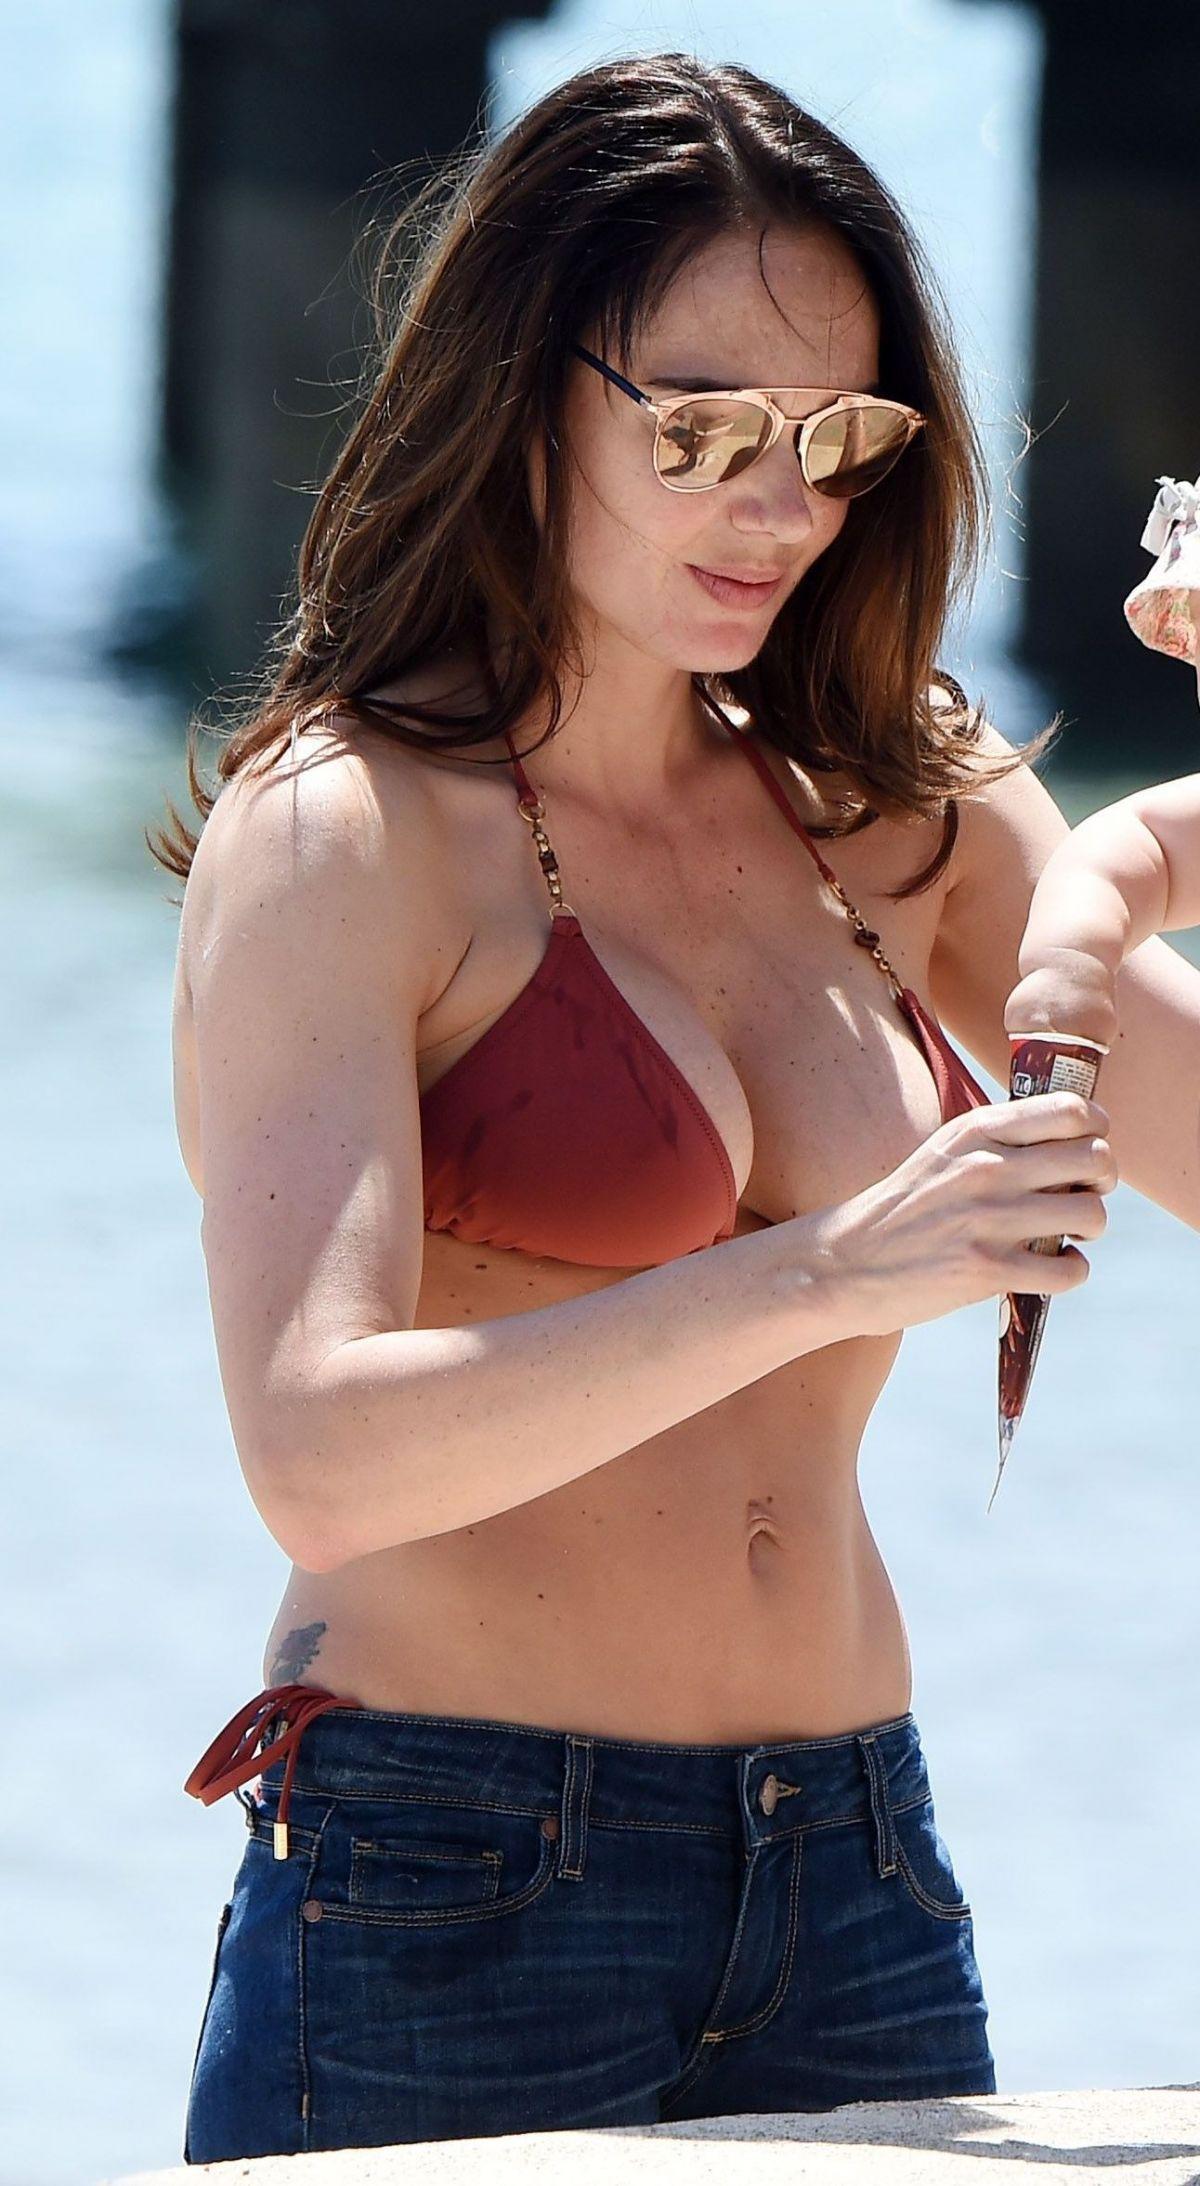 Tamara Ecclestone nudes (38 pictures) Topless, Instagram, braless